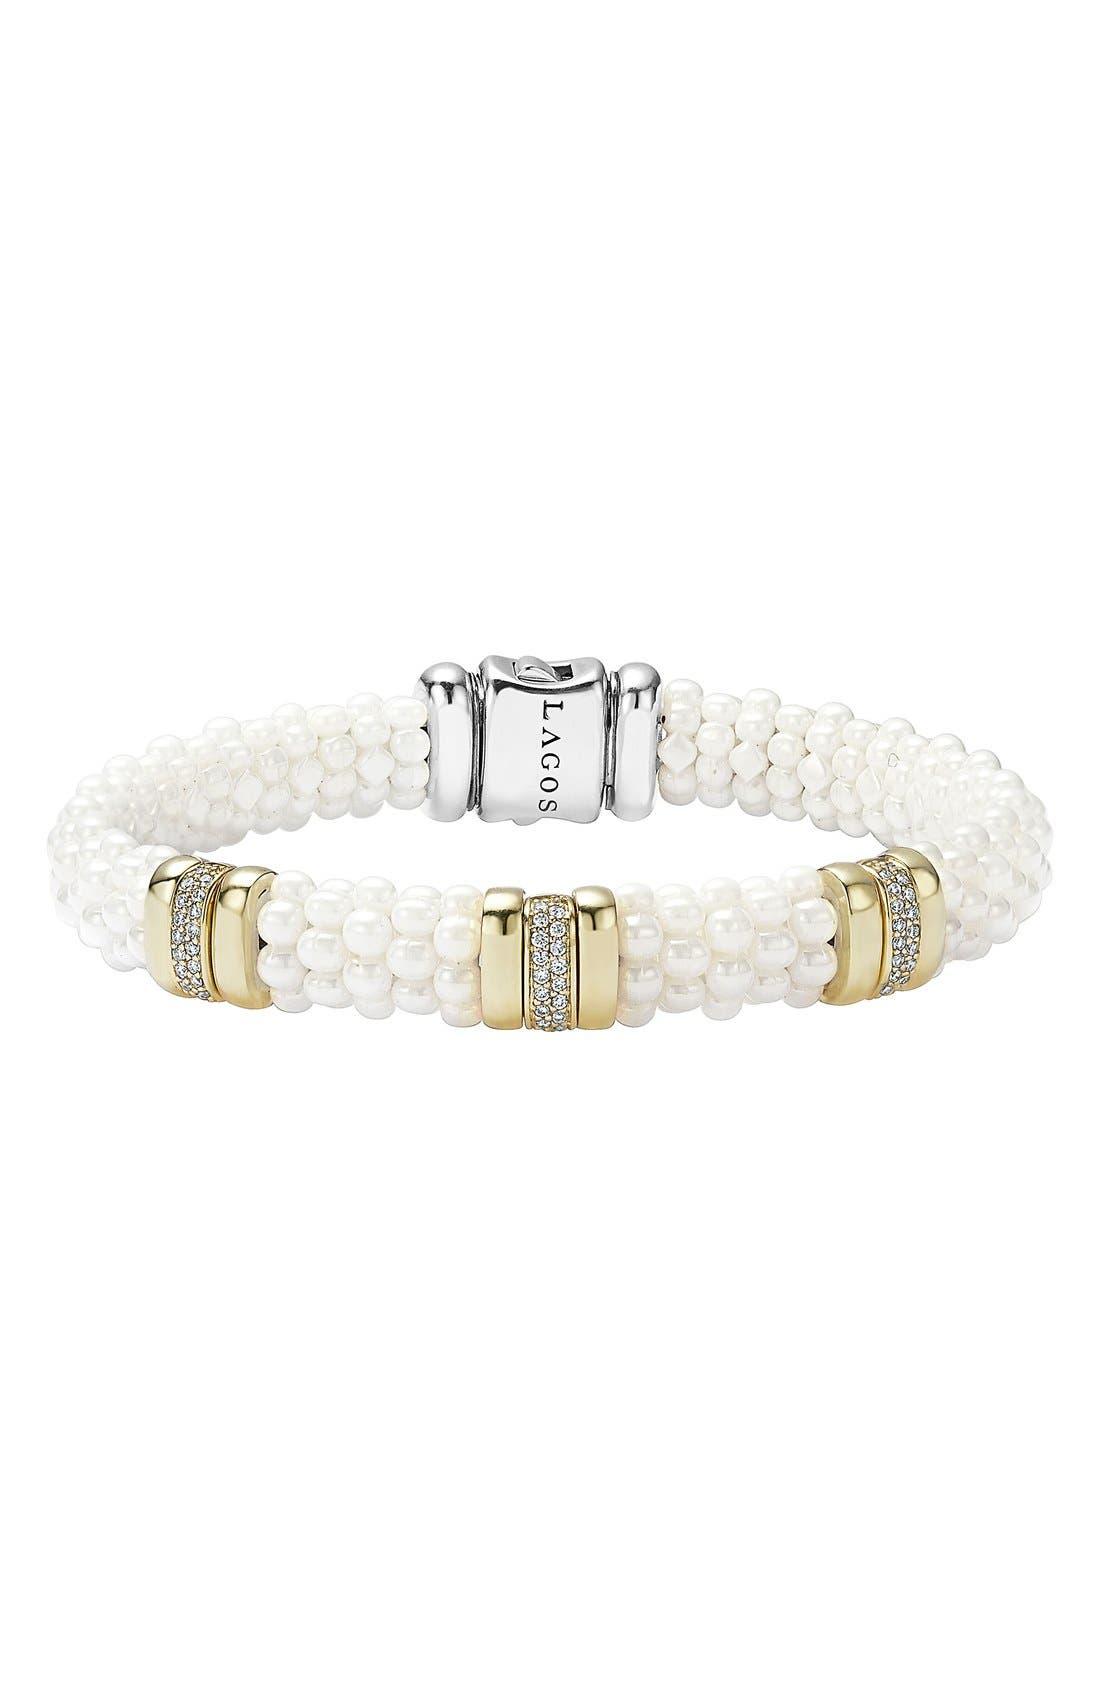 Alternate Image 1 Selected - LAGOS 'White Caviar' Three Station Bracelet